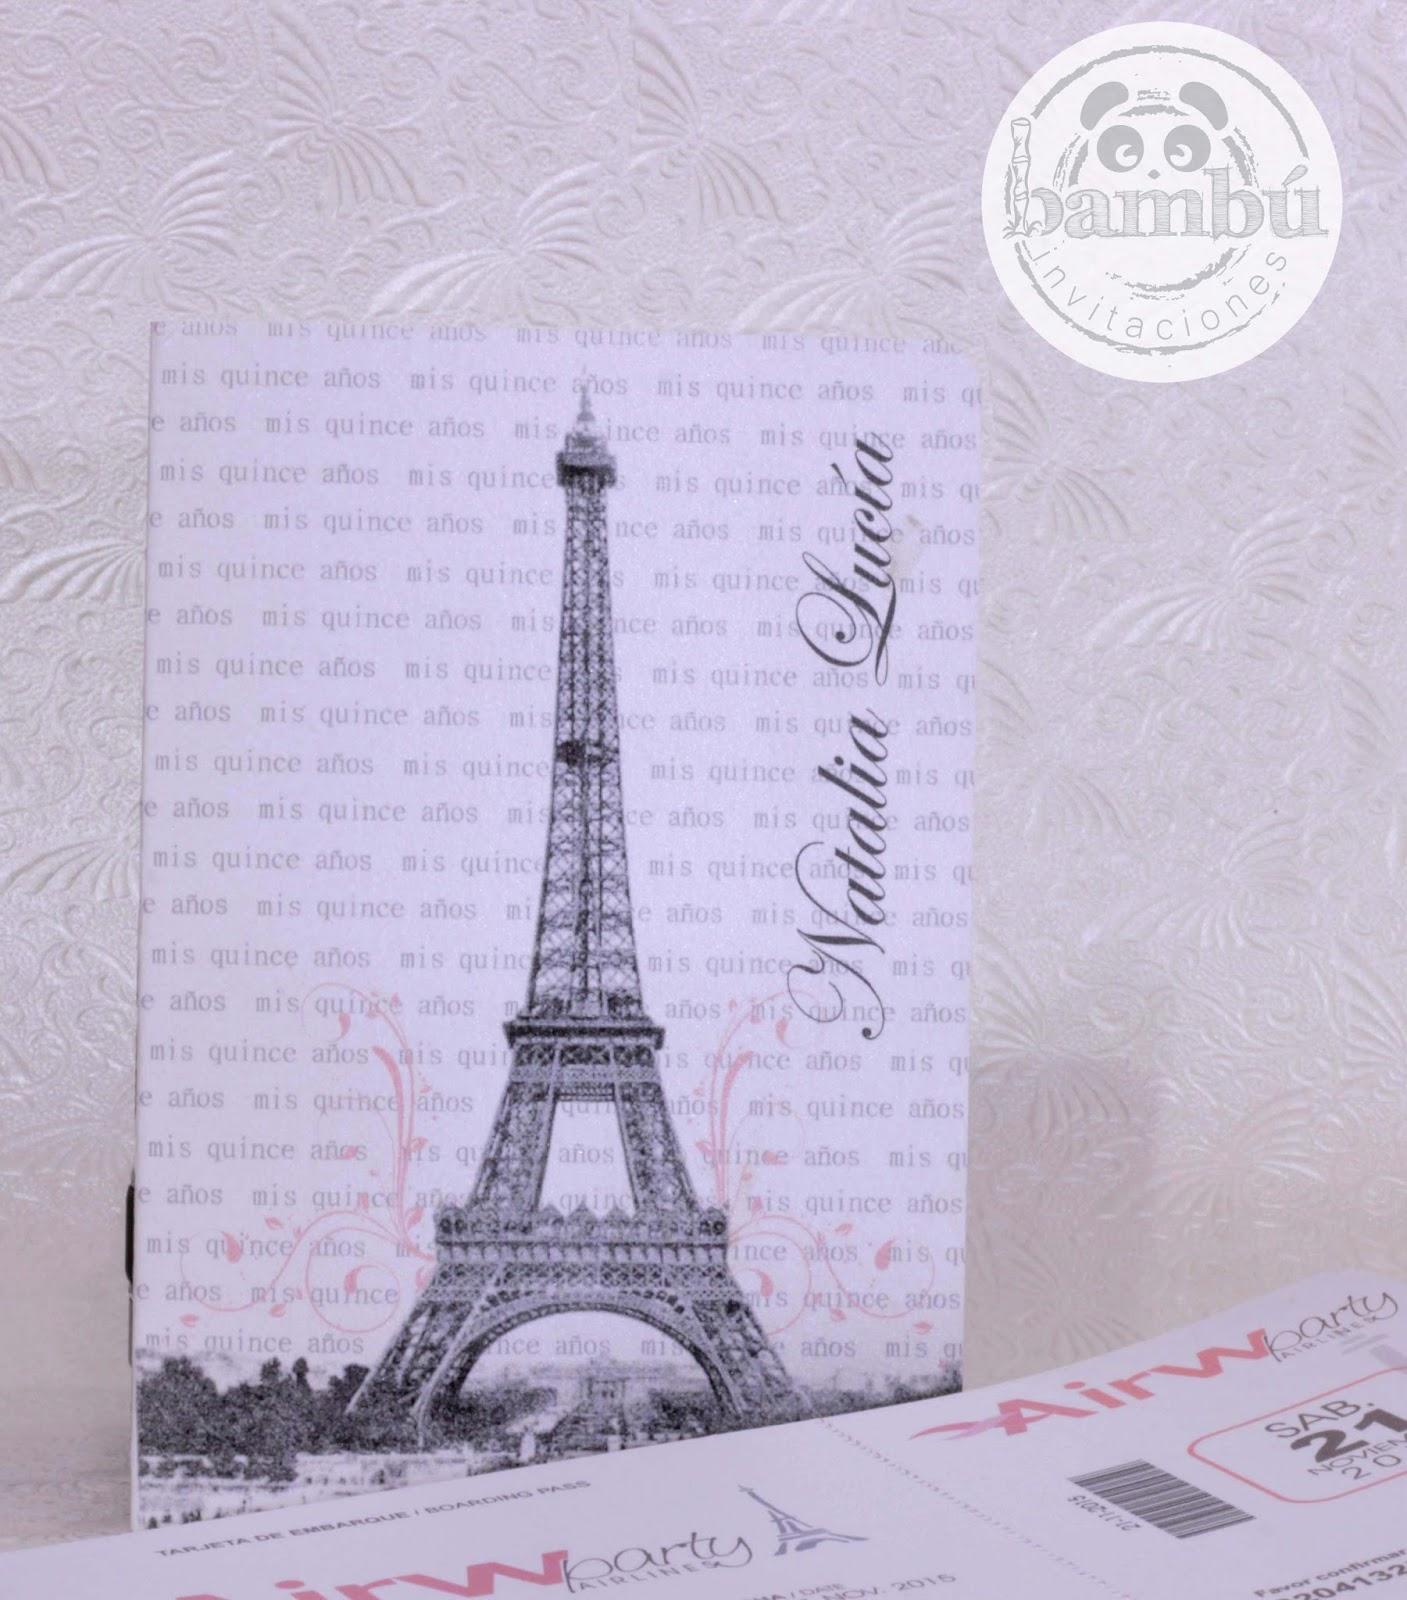 Europa Vintage Tarjetas Postales - Compra lotes